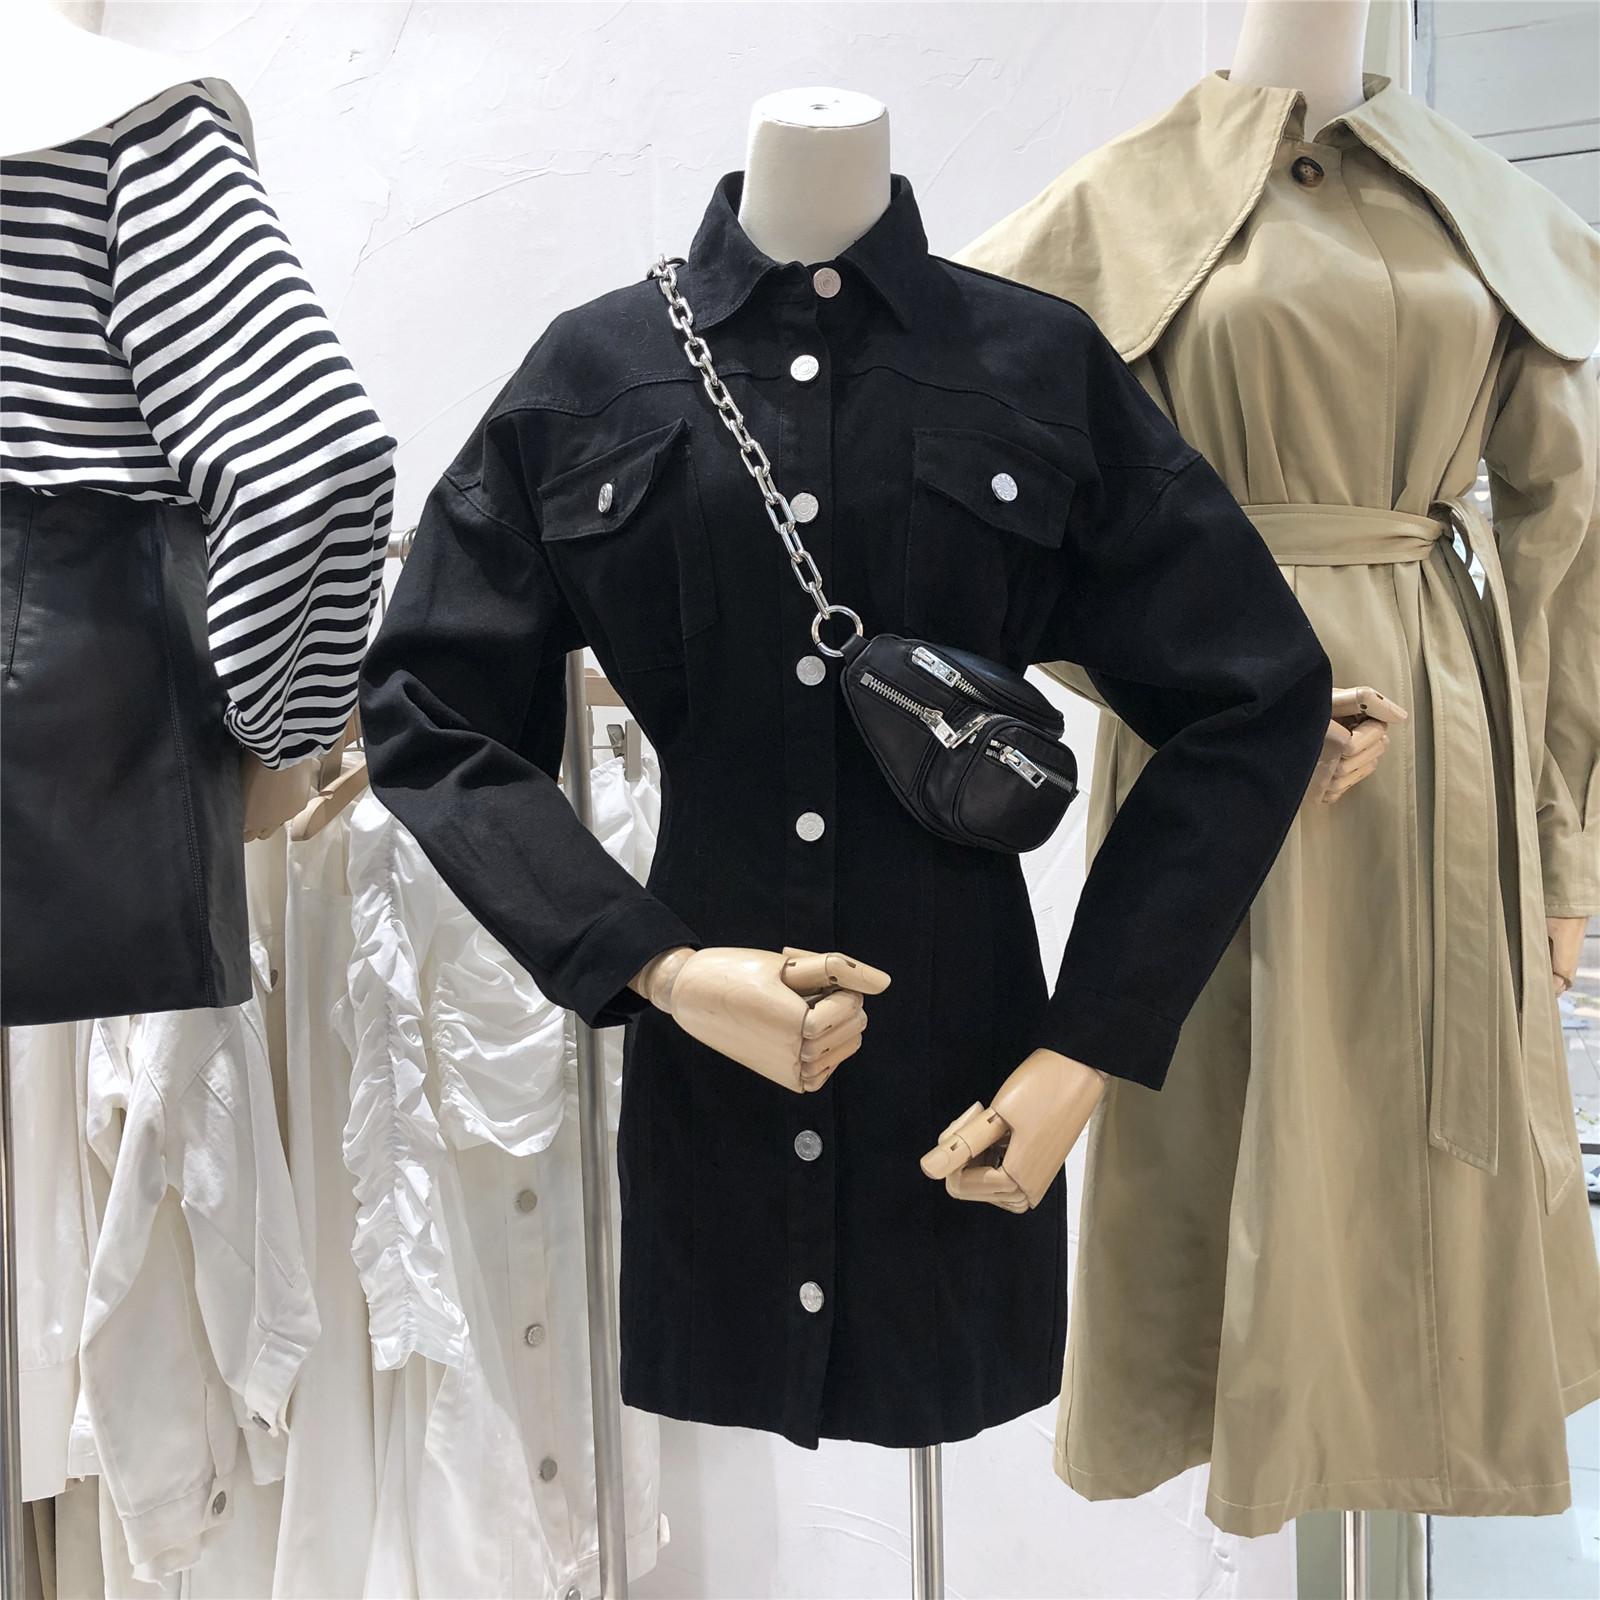 star秋季新款韩版polo领长袖短裙限时抢购